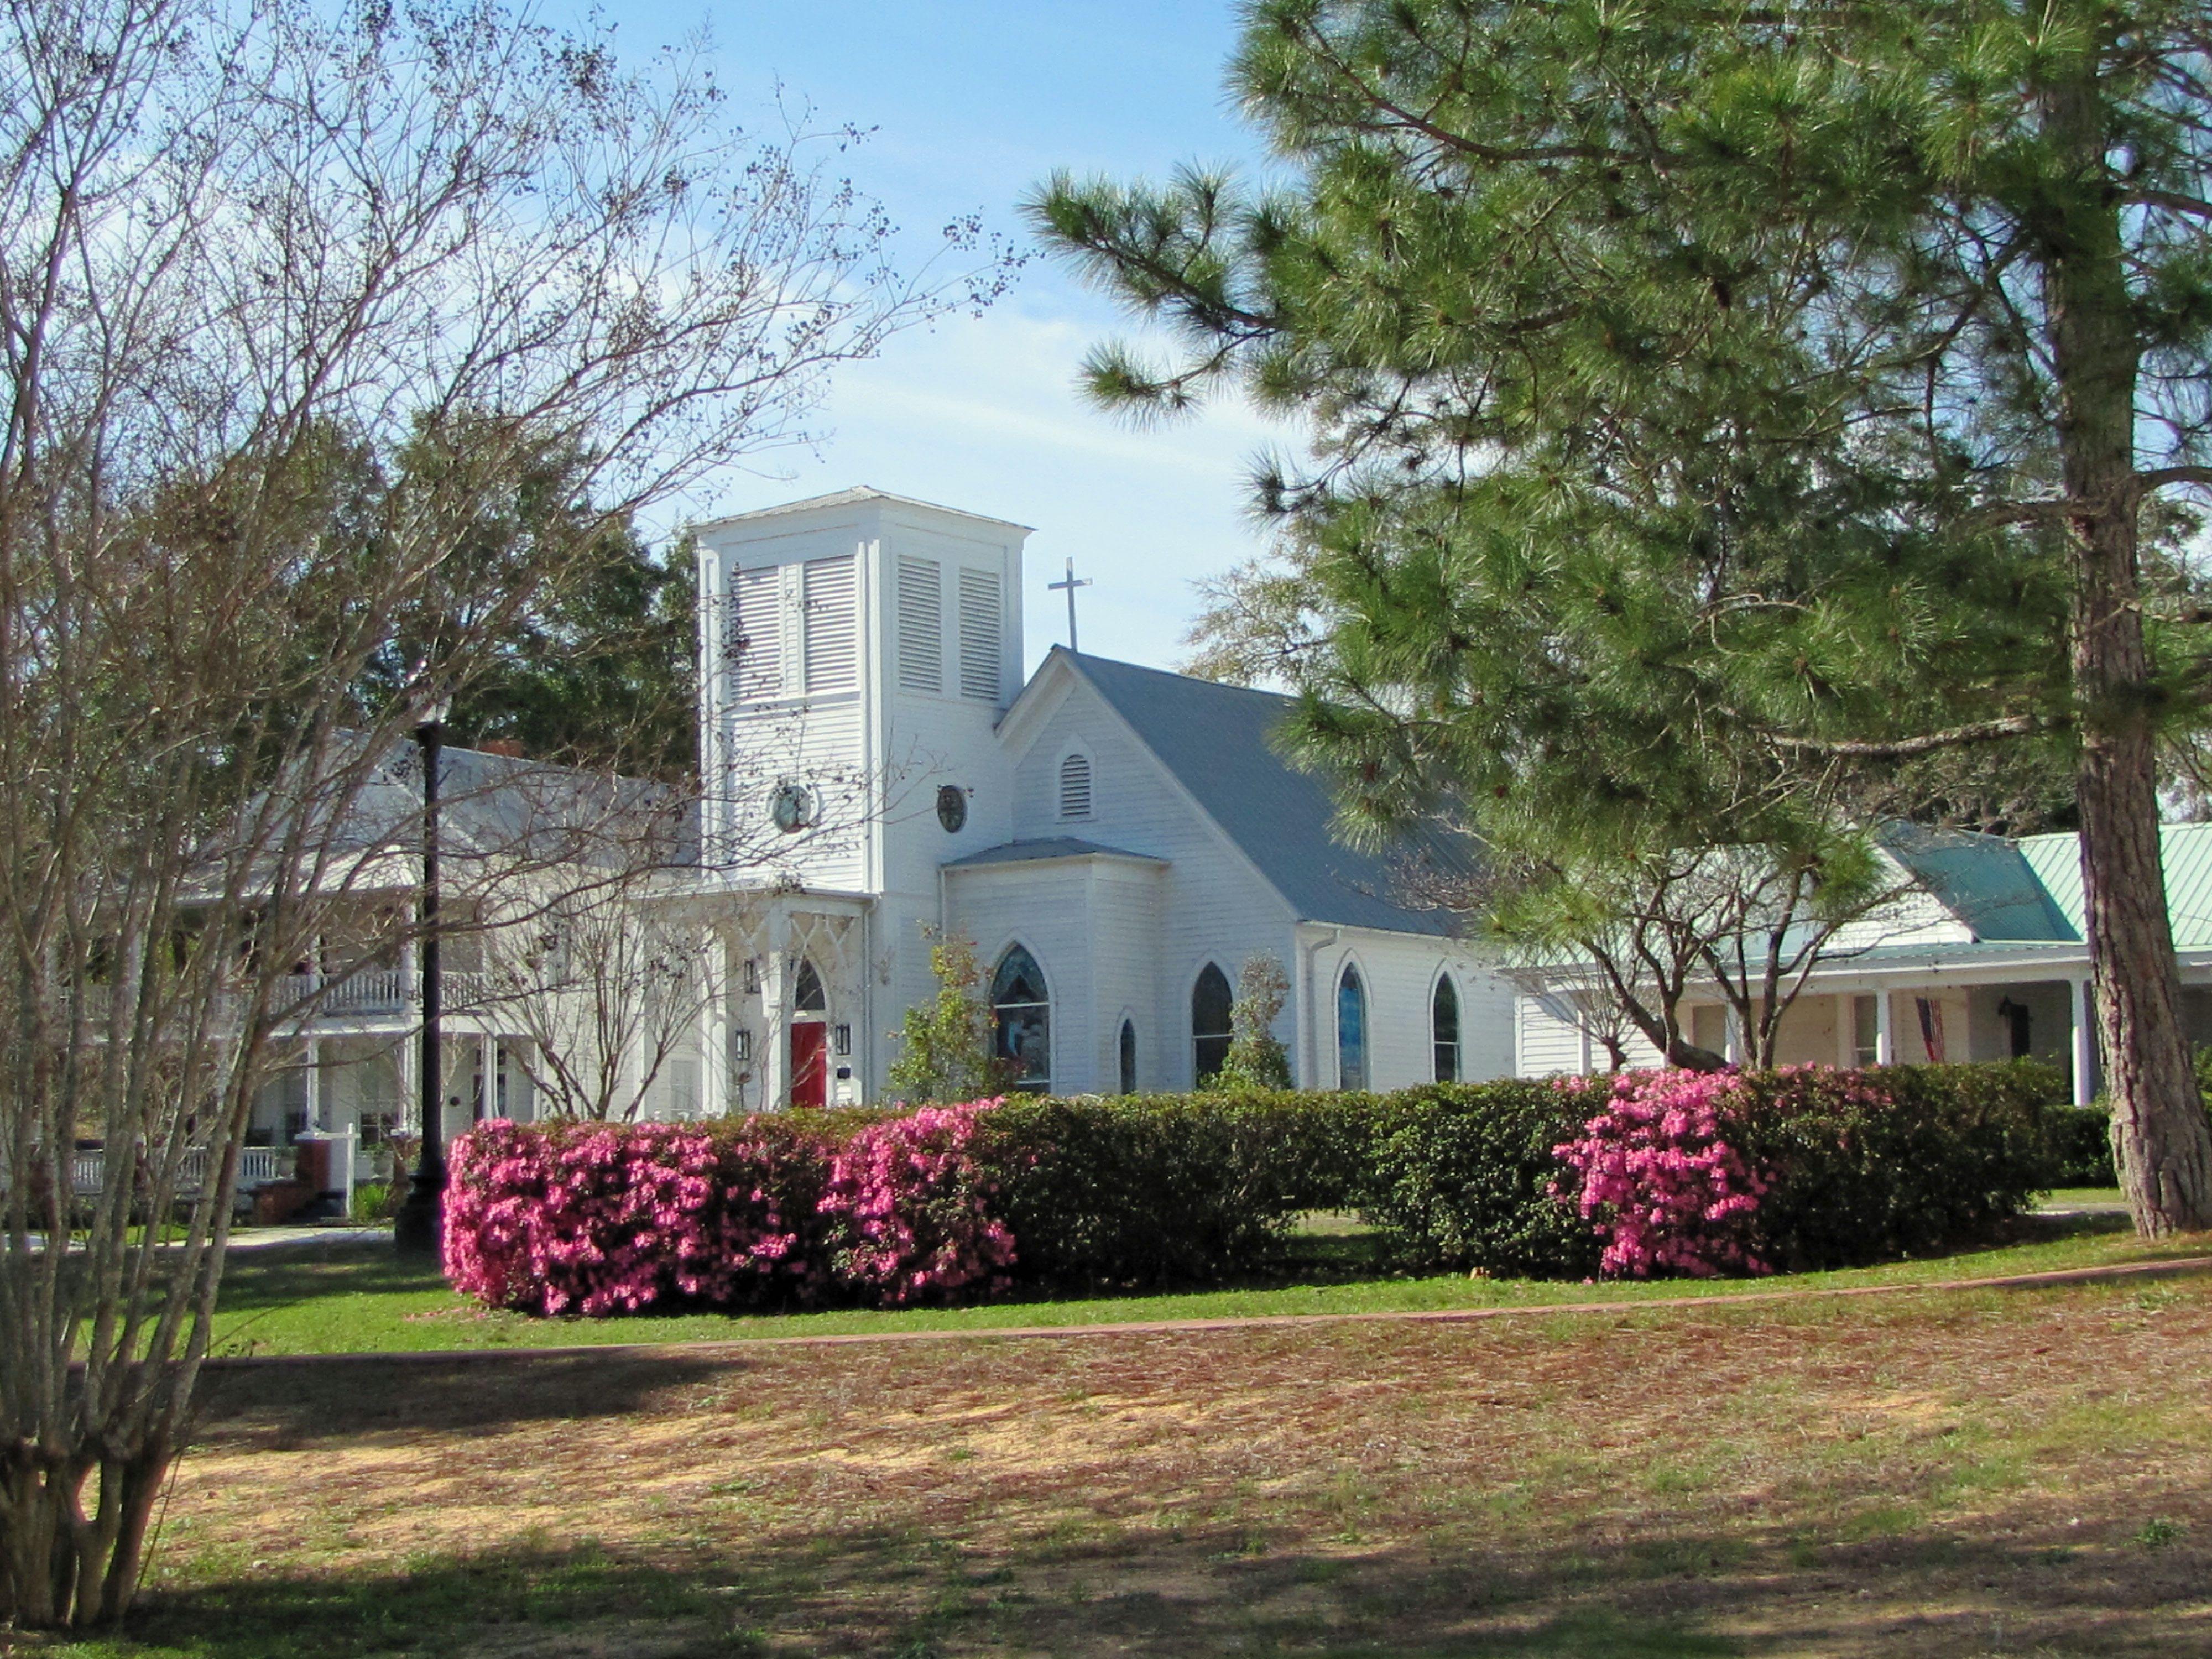 Free gay dating cranberry township pennsylvania